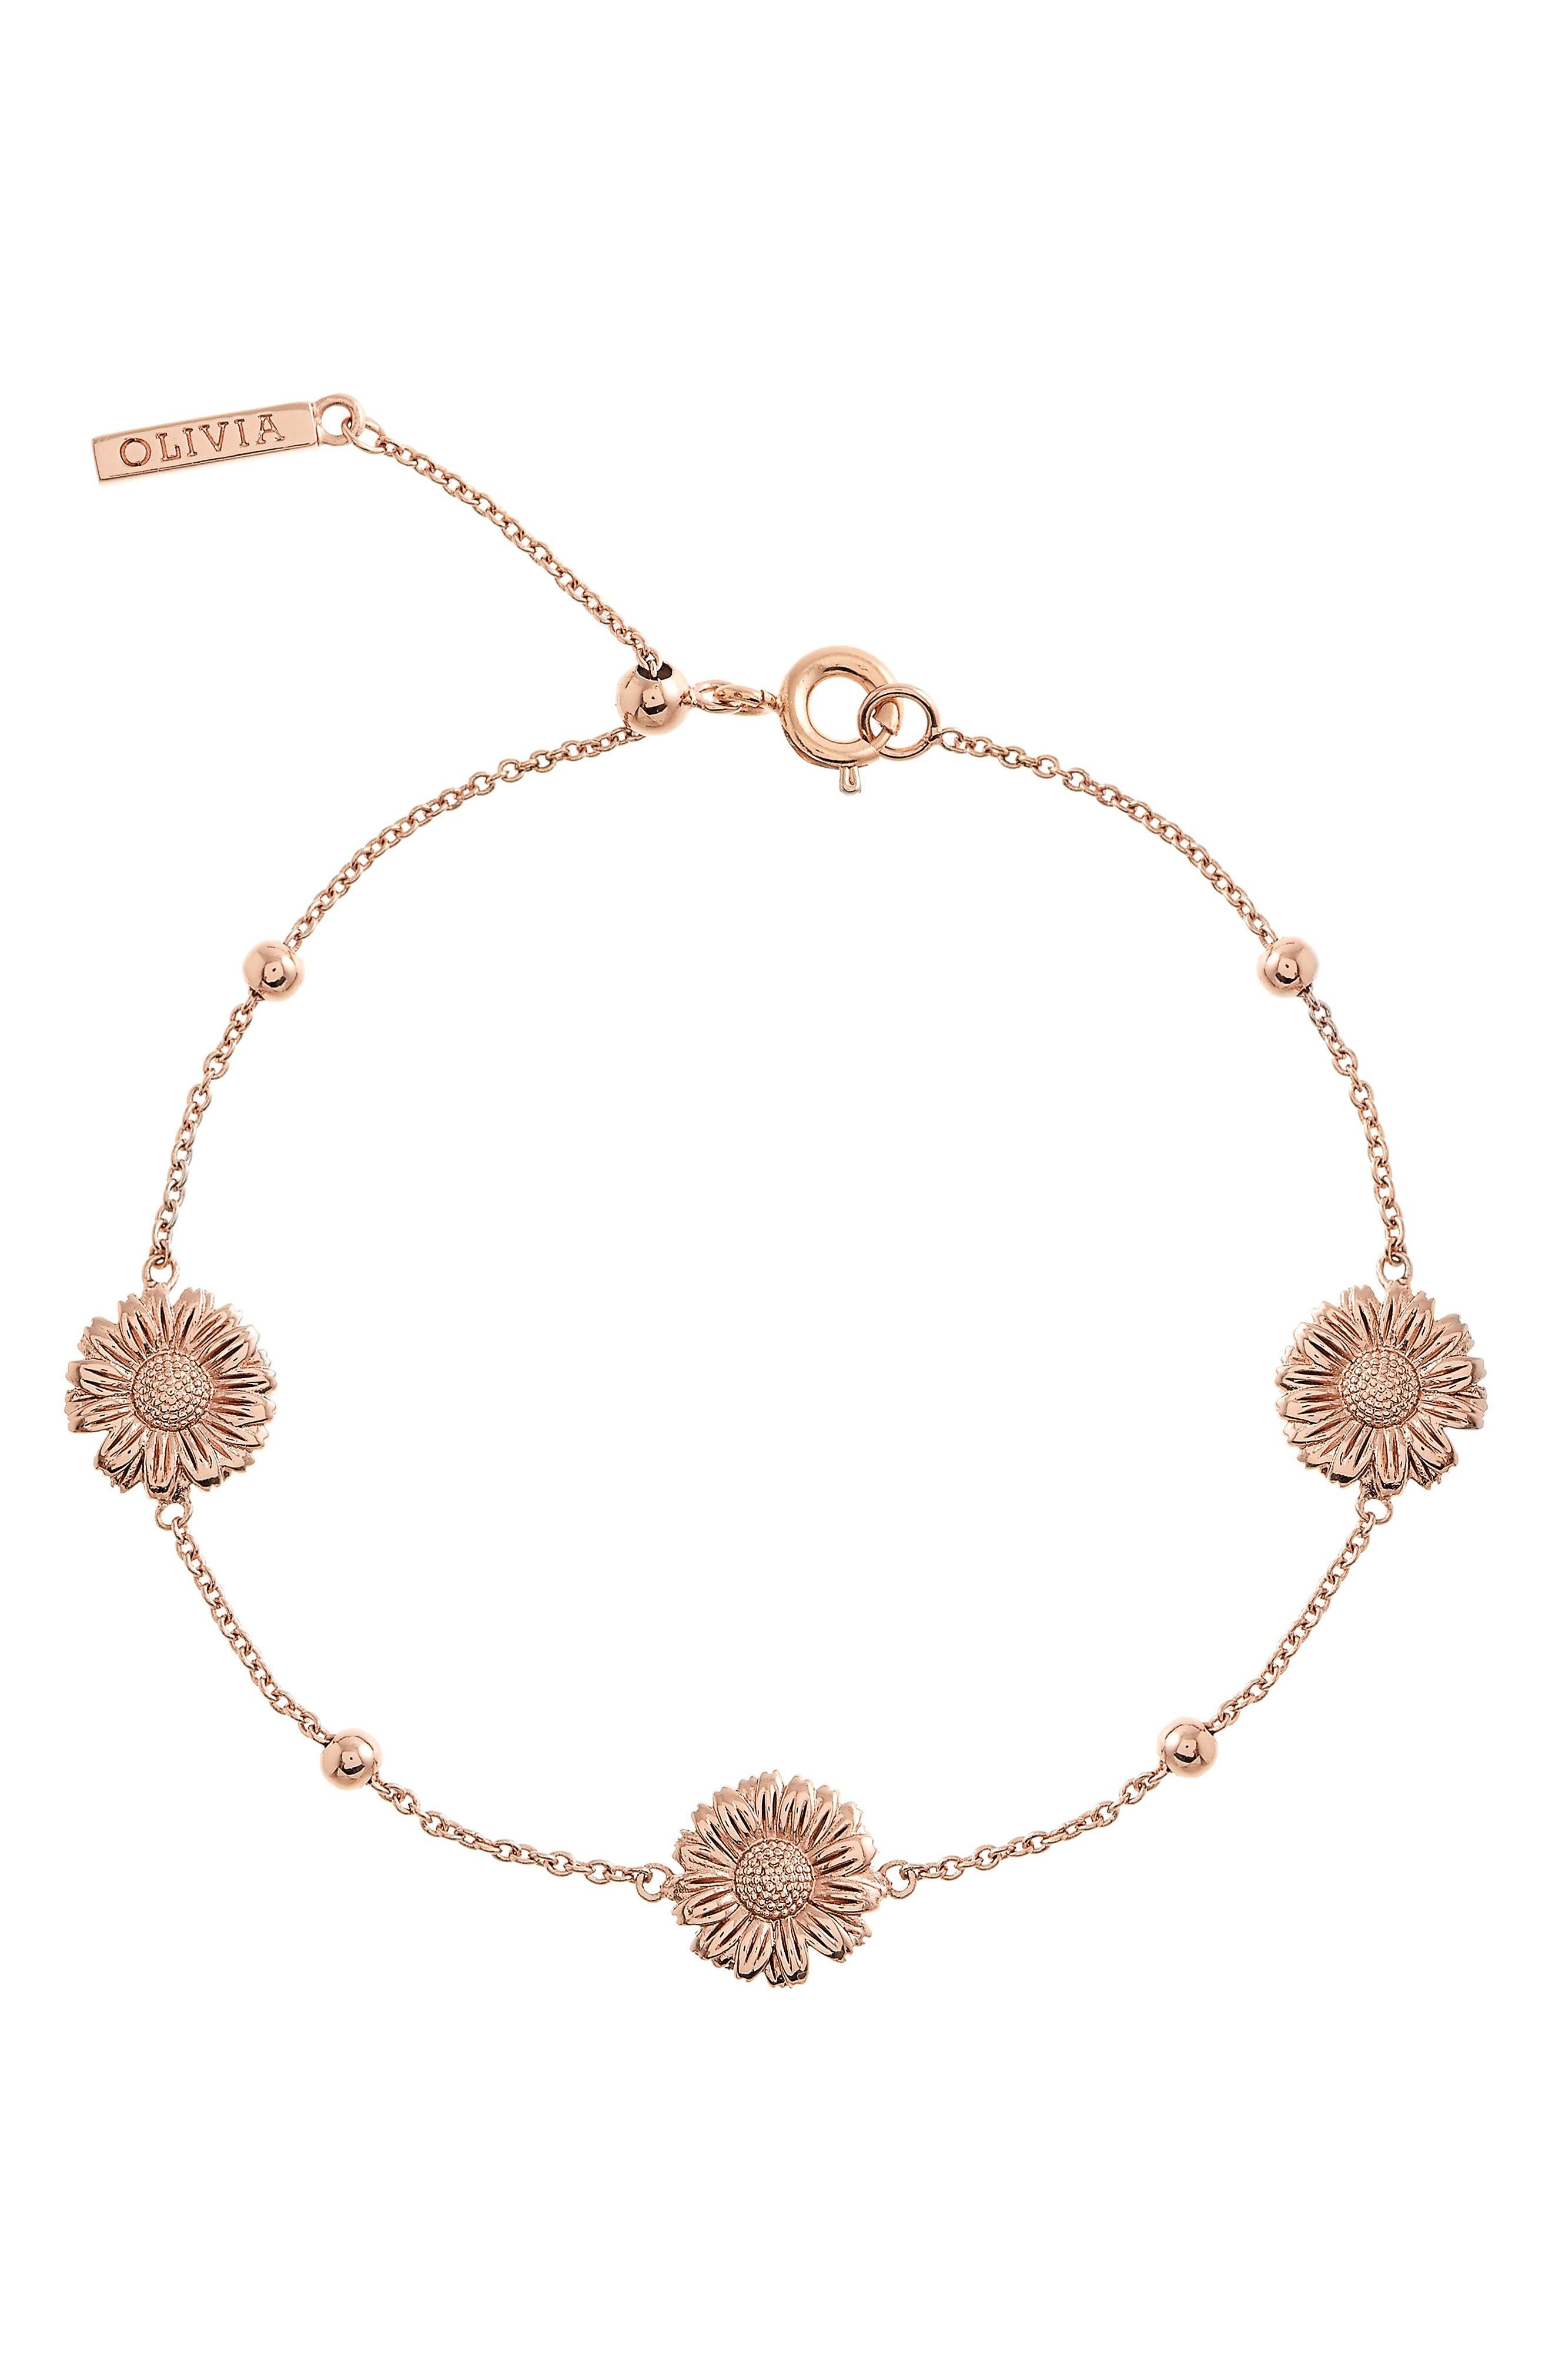 3D Daisy Ball Chain Bracelet,                             Main thumbnail 1, color,                             ROSE GOLD